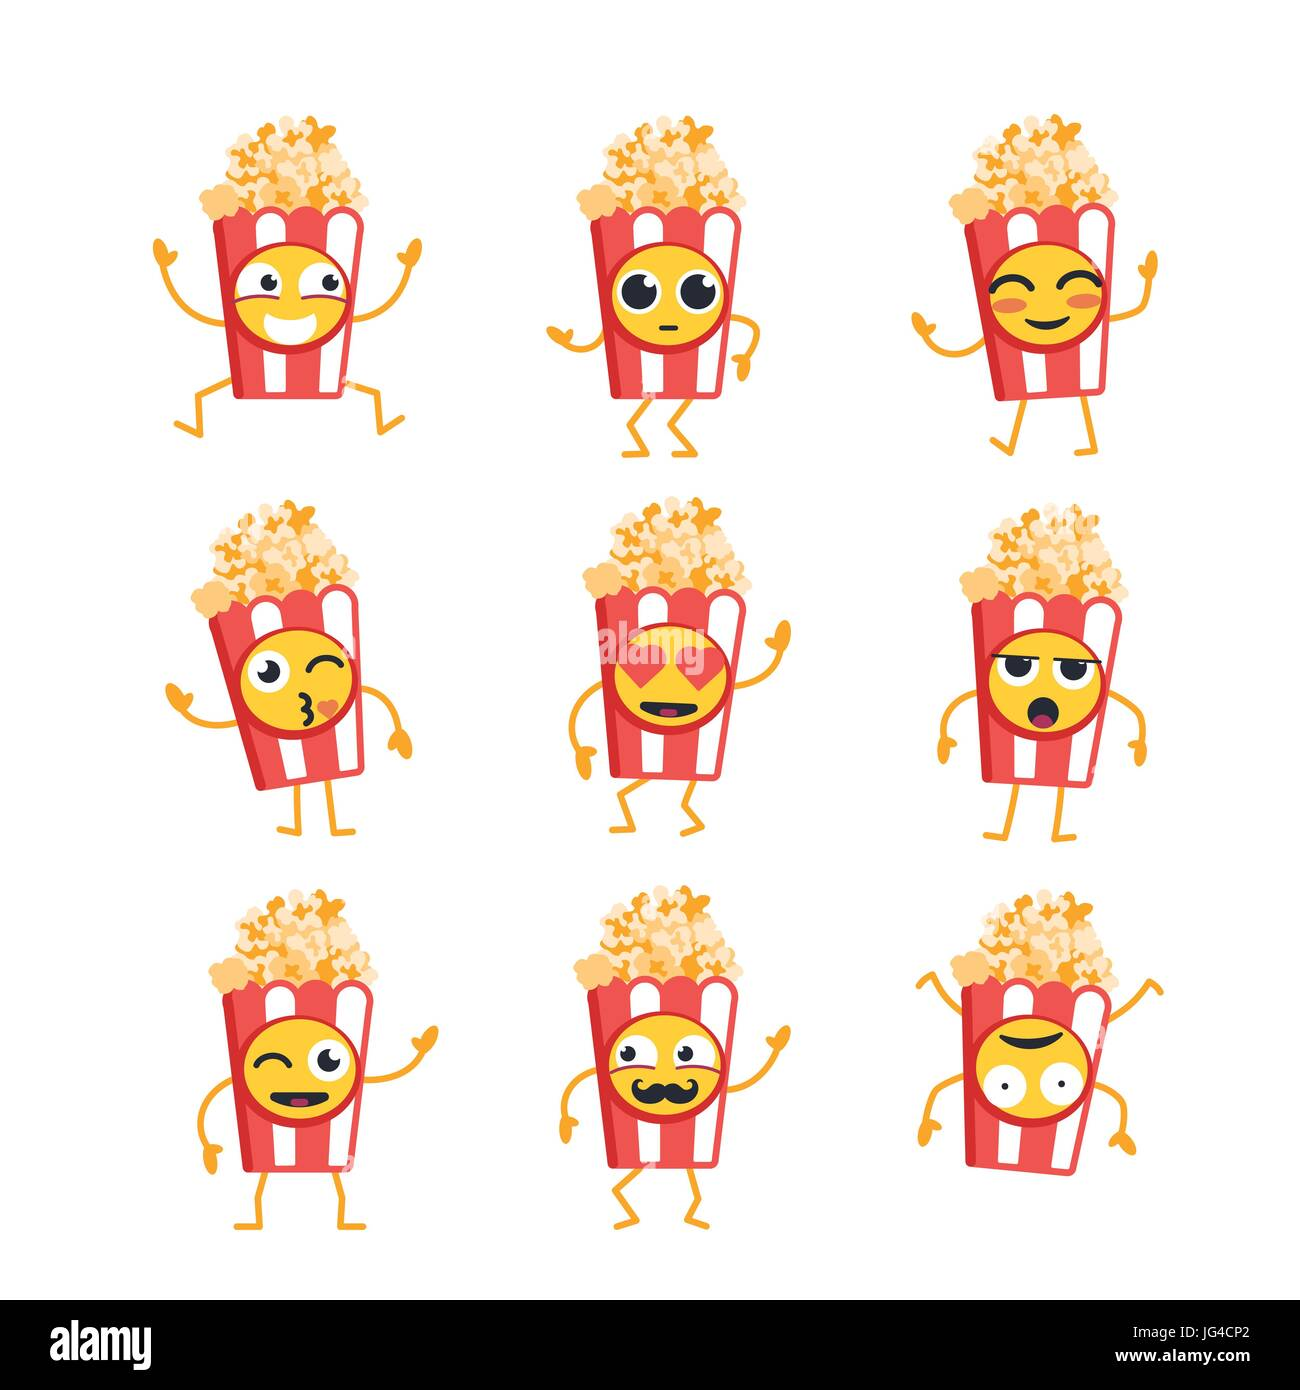 Popcorn Cartoon Character - modern vector template set of mascot illustrations. Gift images of popcorn dancing, - Stock Vector